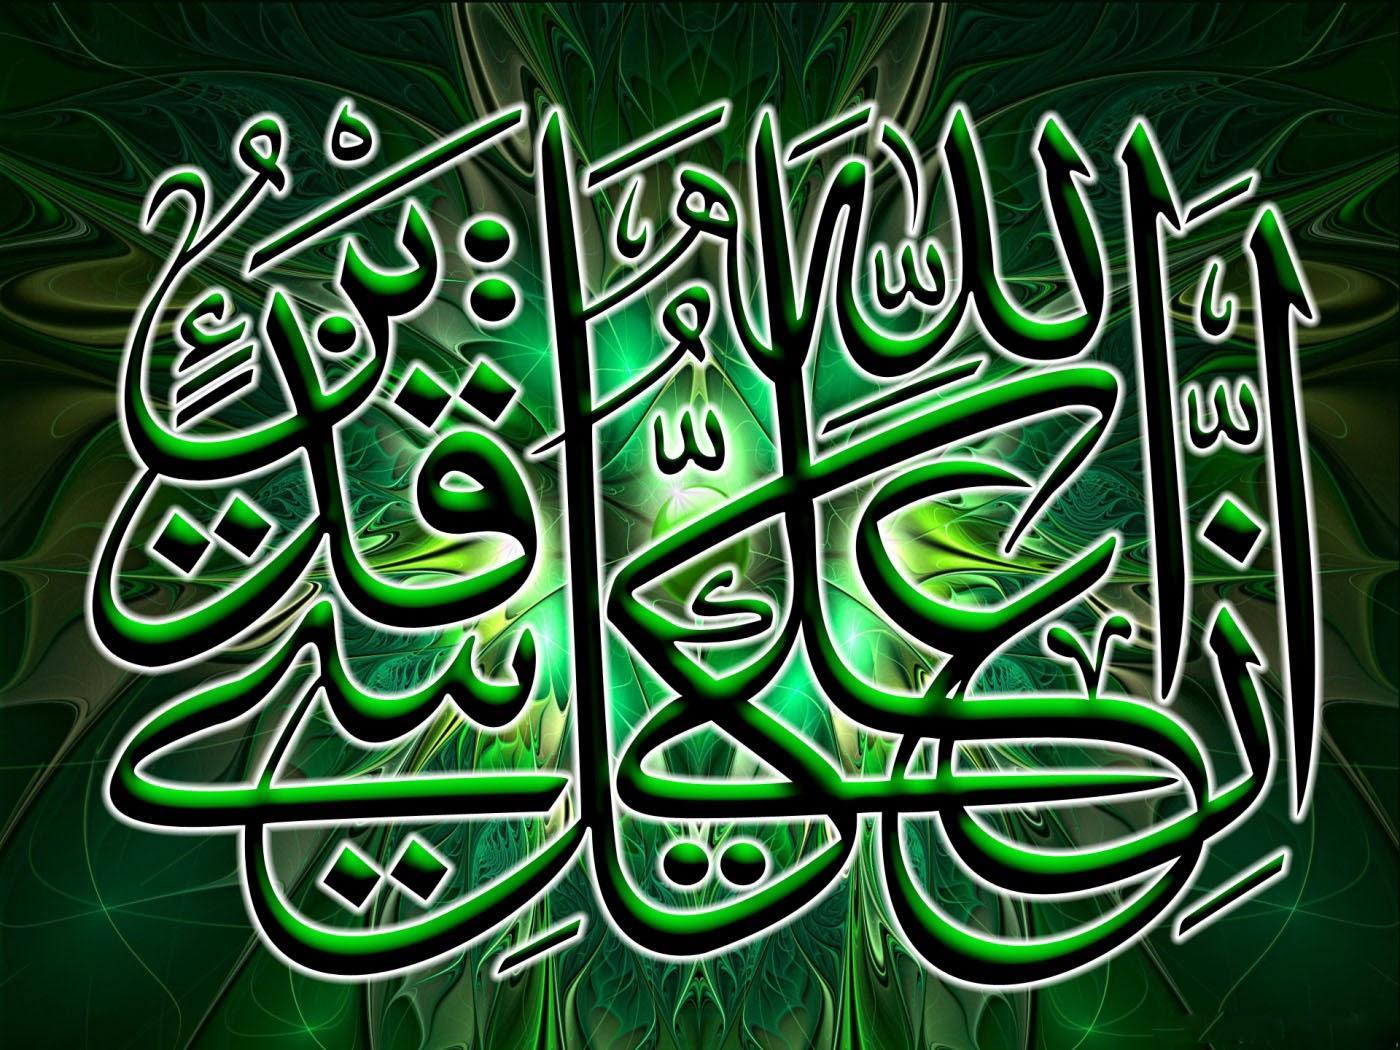 large.573aaa8947fc6 QuraniAyatLatestWallpaper.jpg.175c44367518c7bc548f3aeb05d86a39